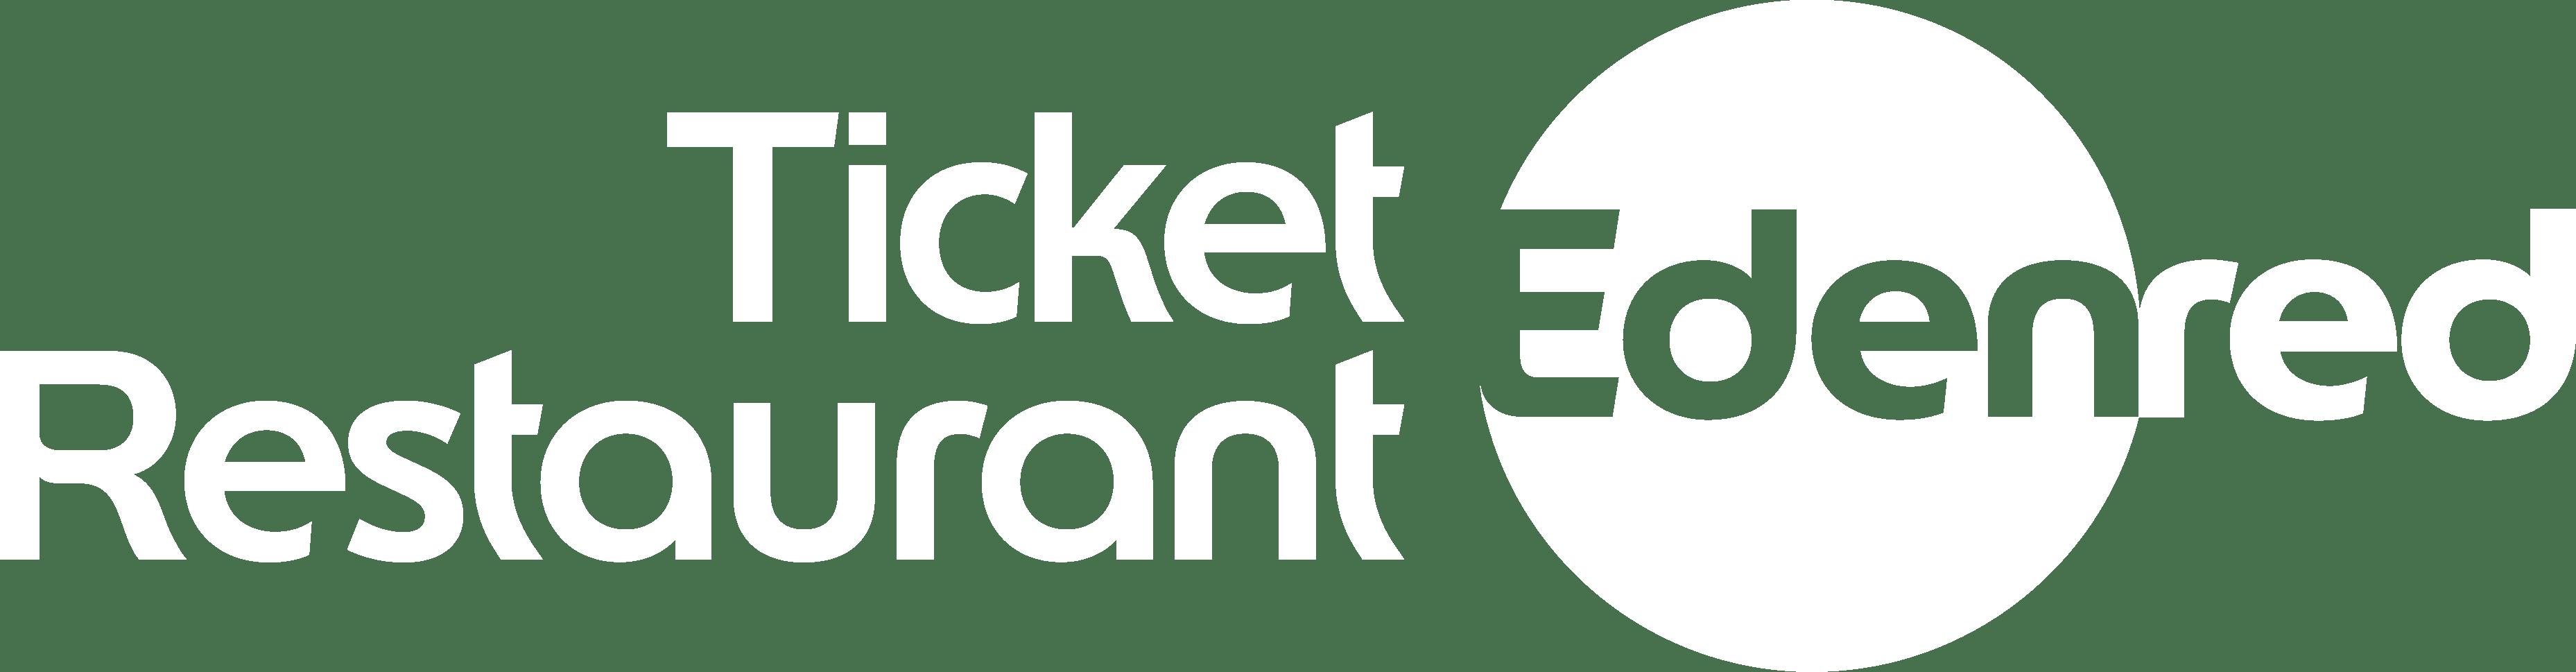 TicketRestaurant-White-RGB